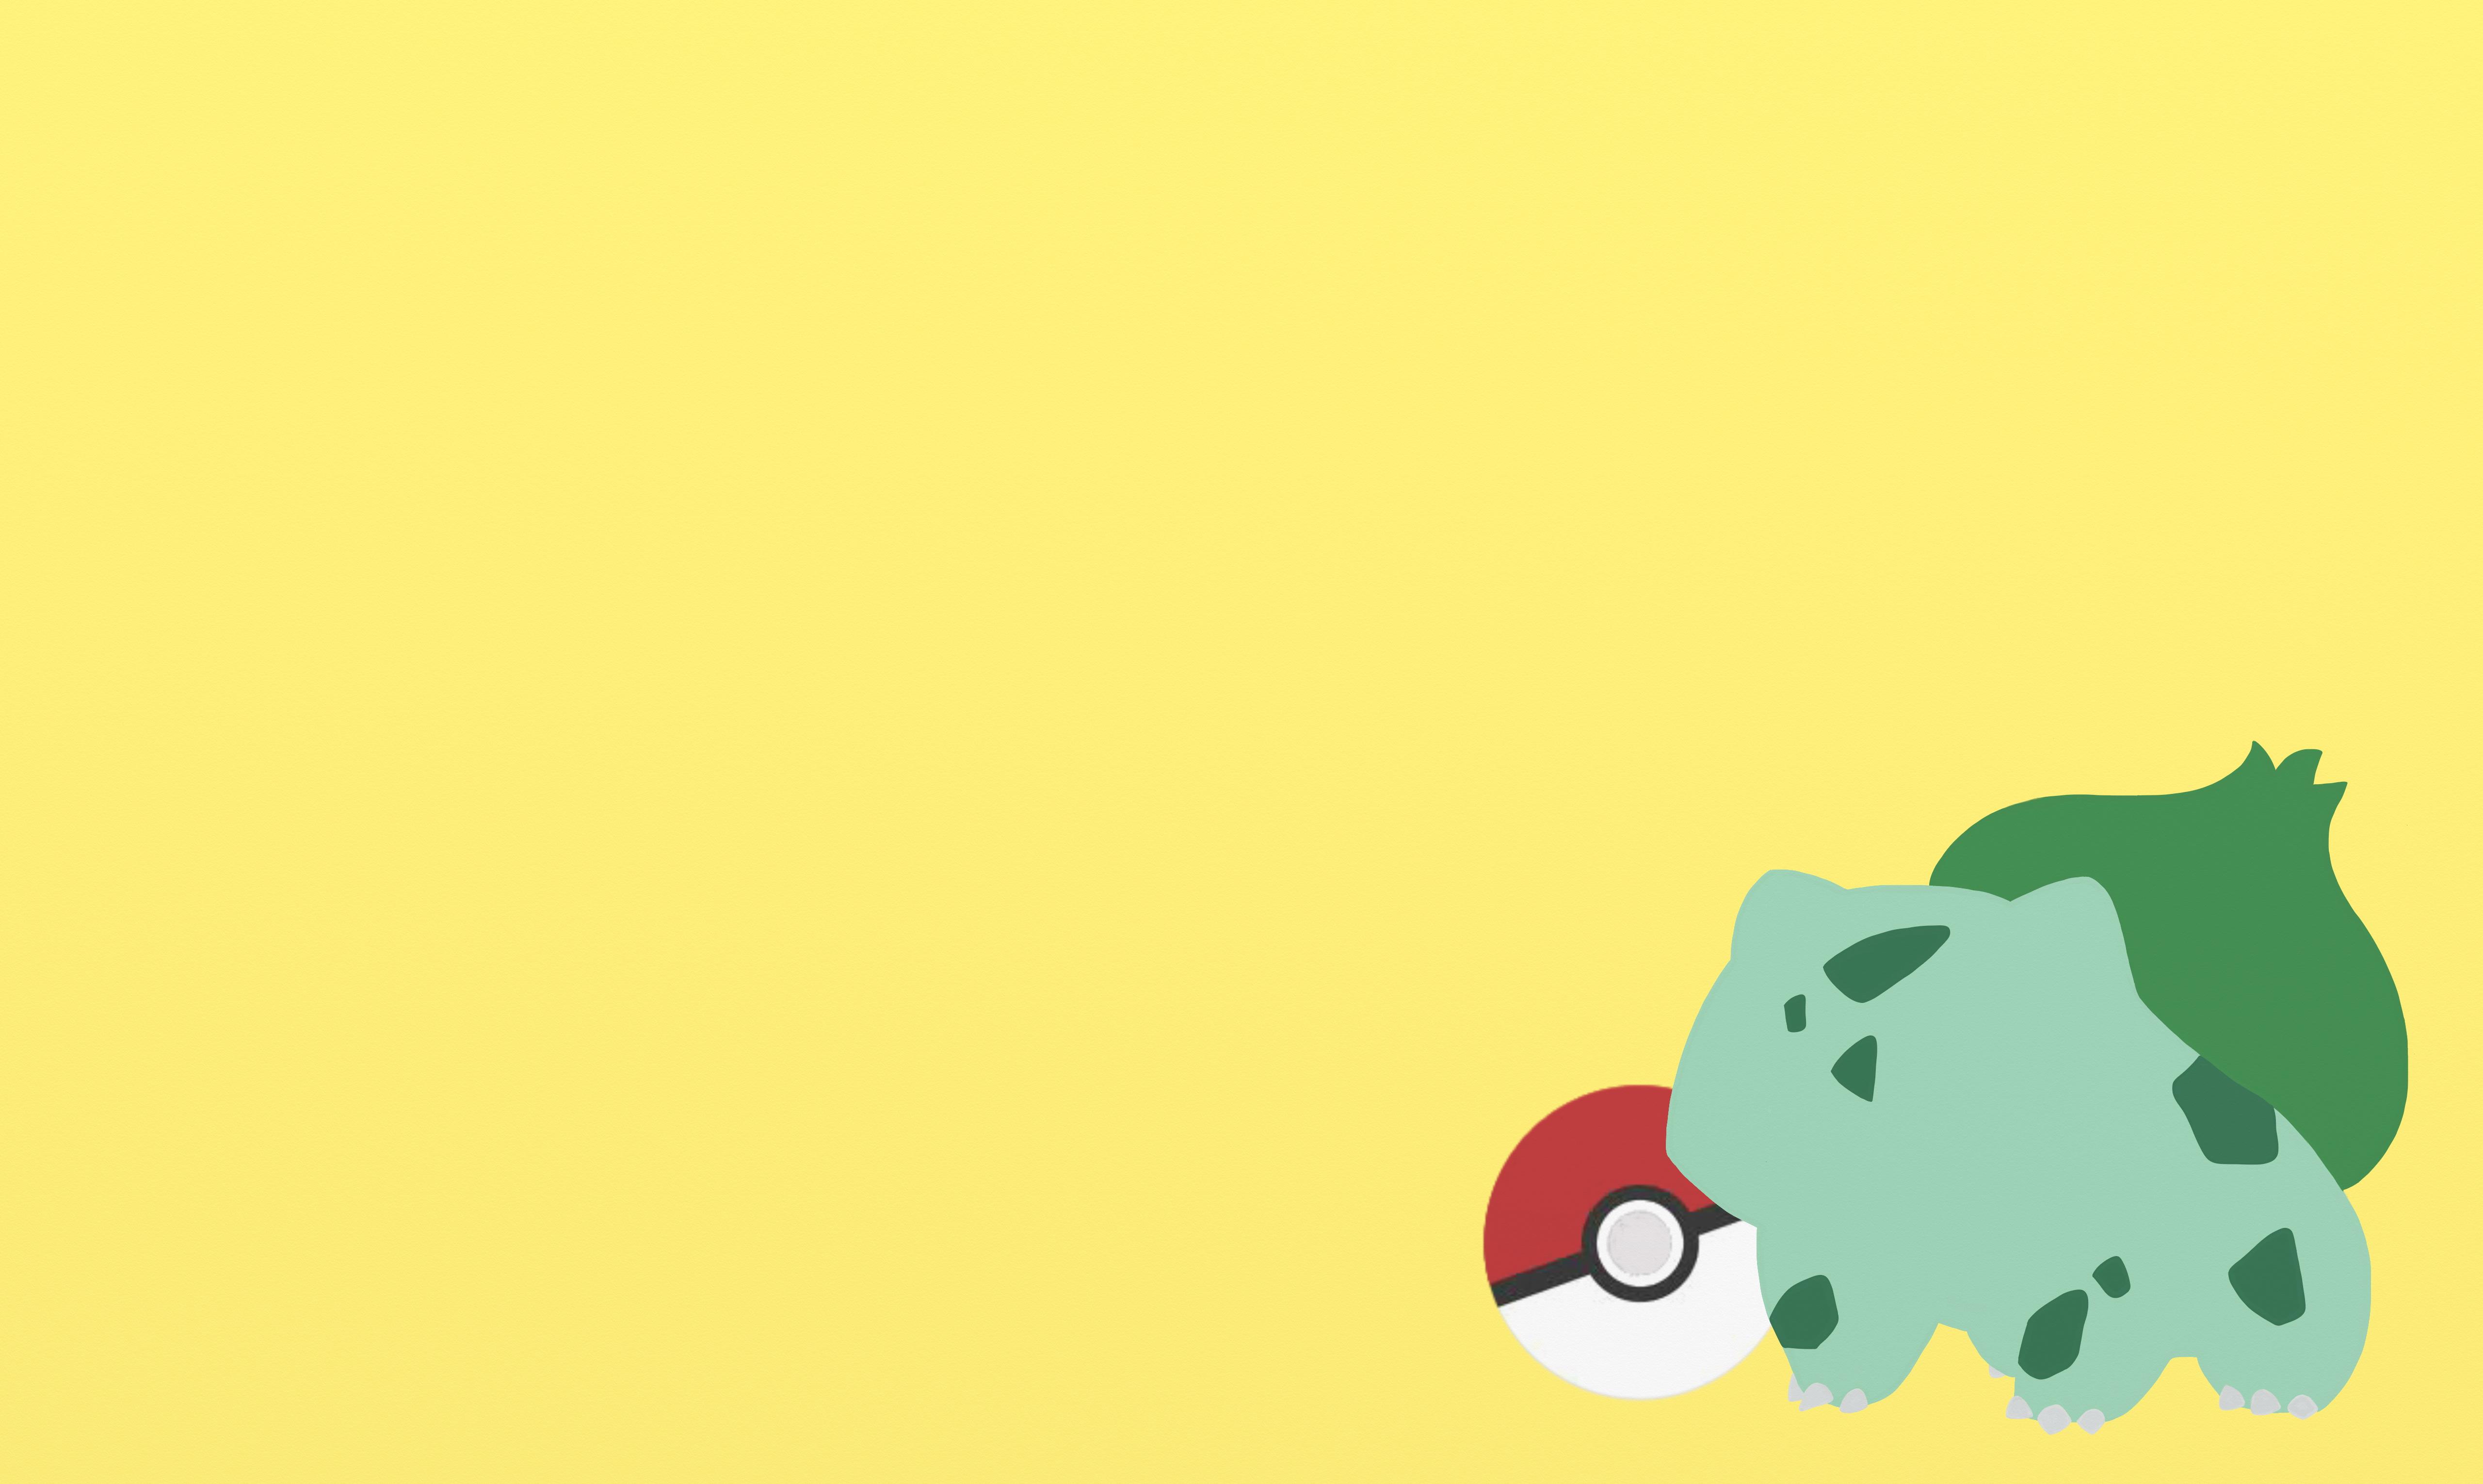 Bulbasaur Wallpaper By Katie350l